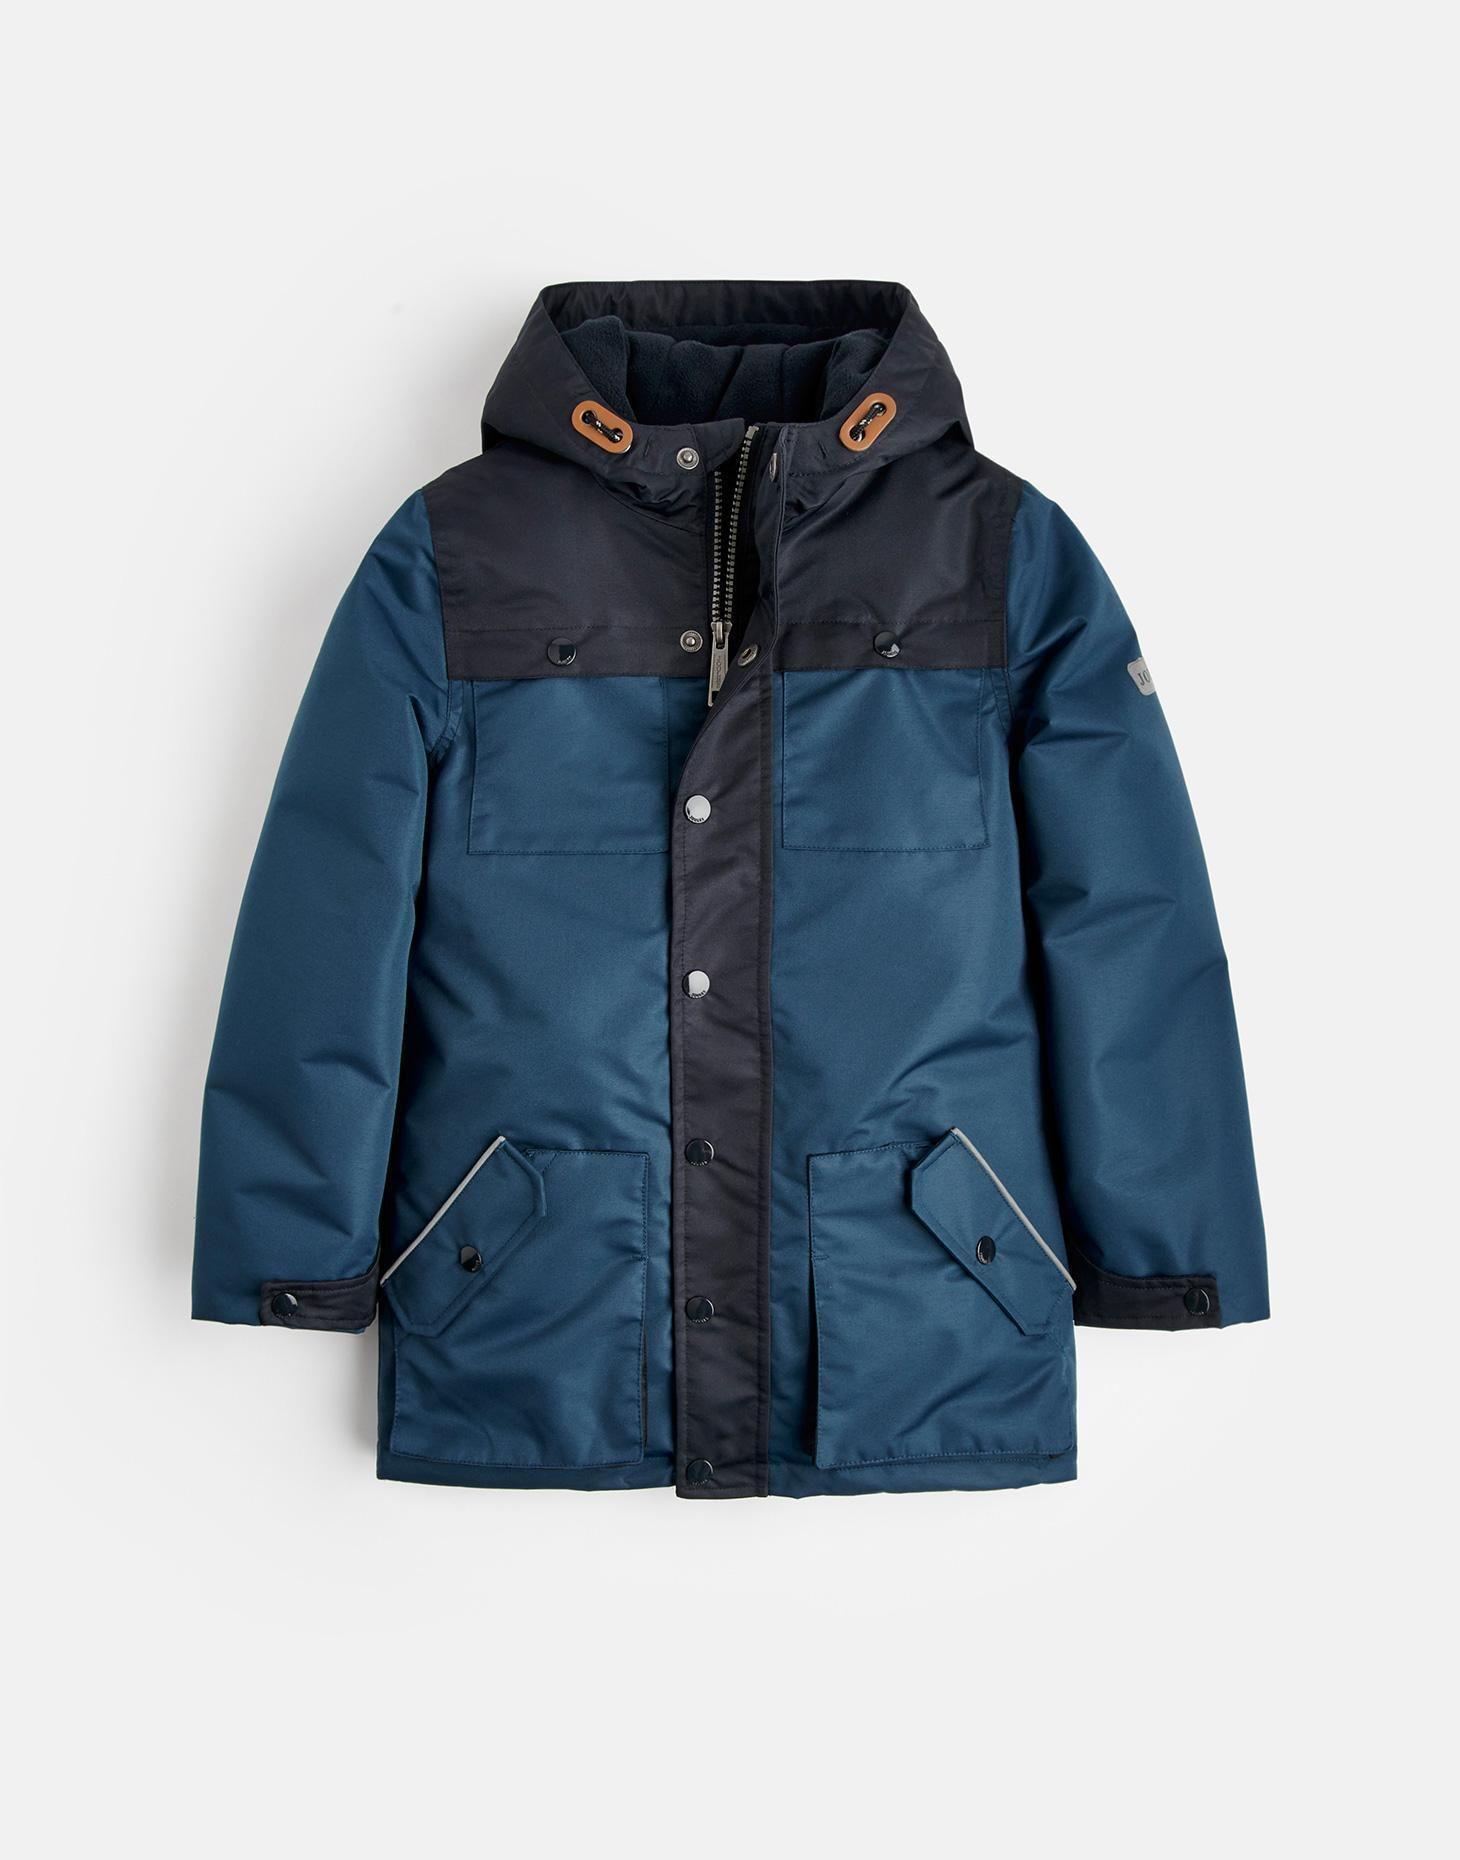 Joules Boys Playground Coat